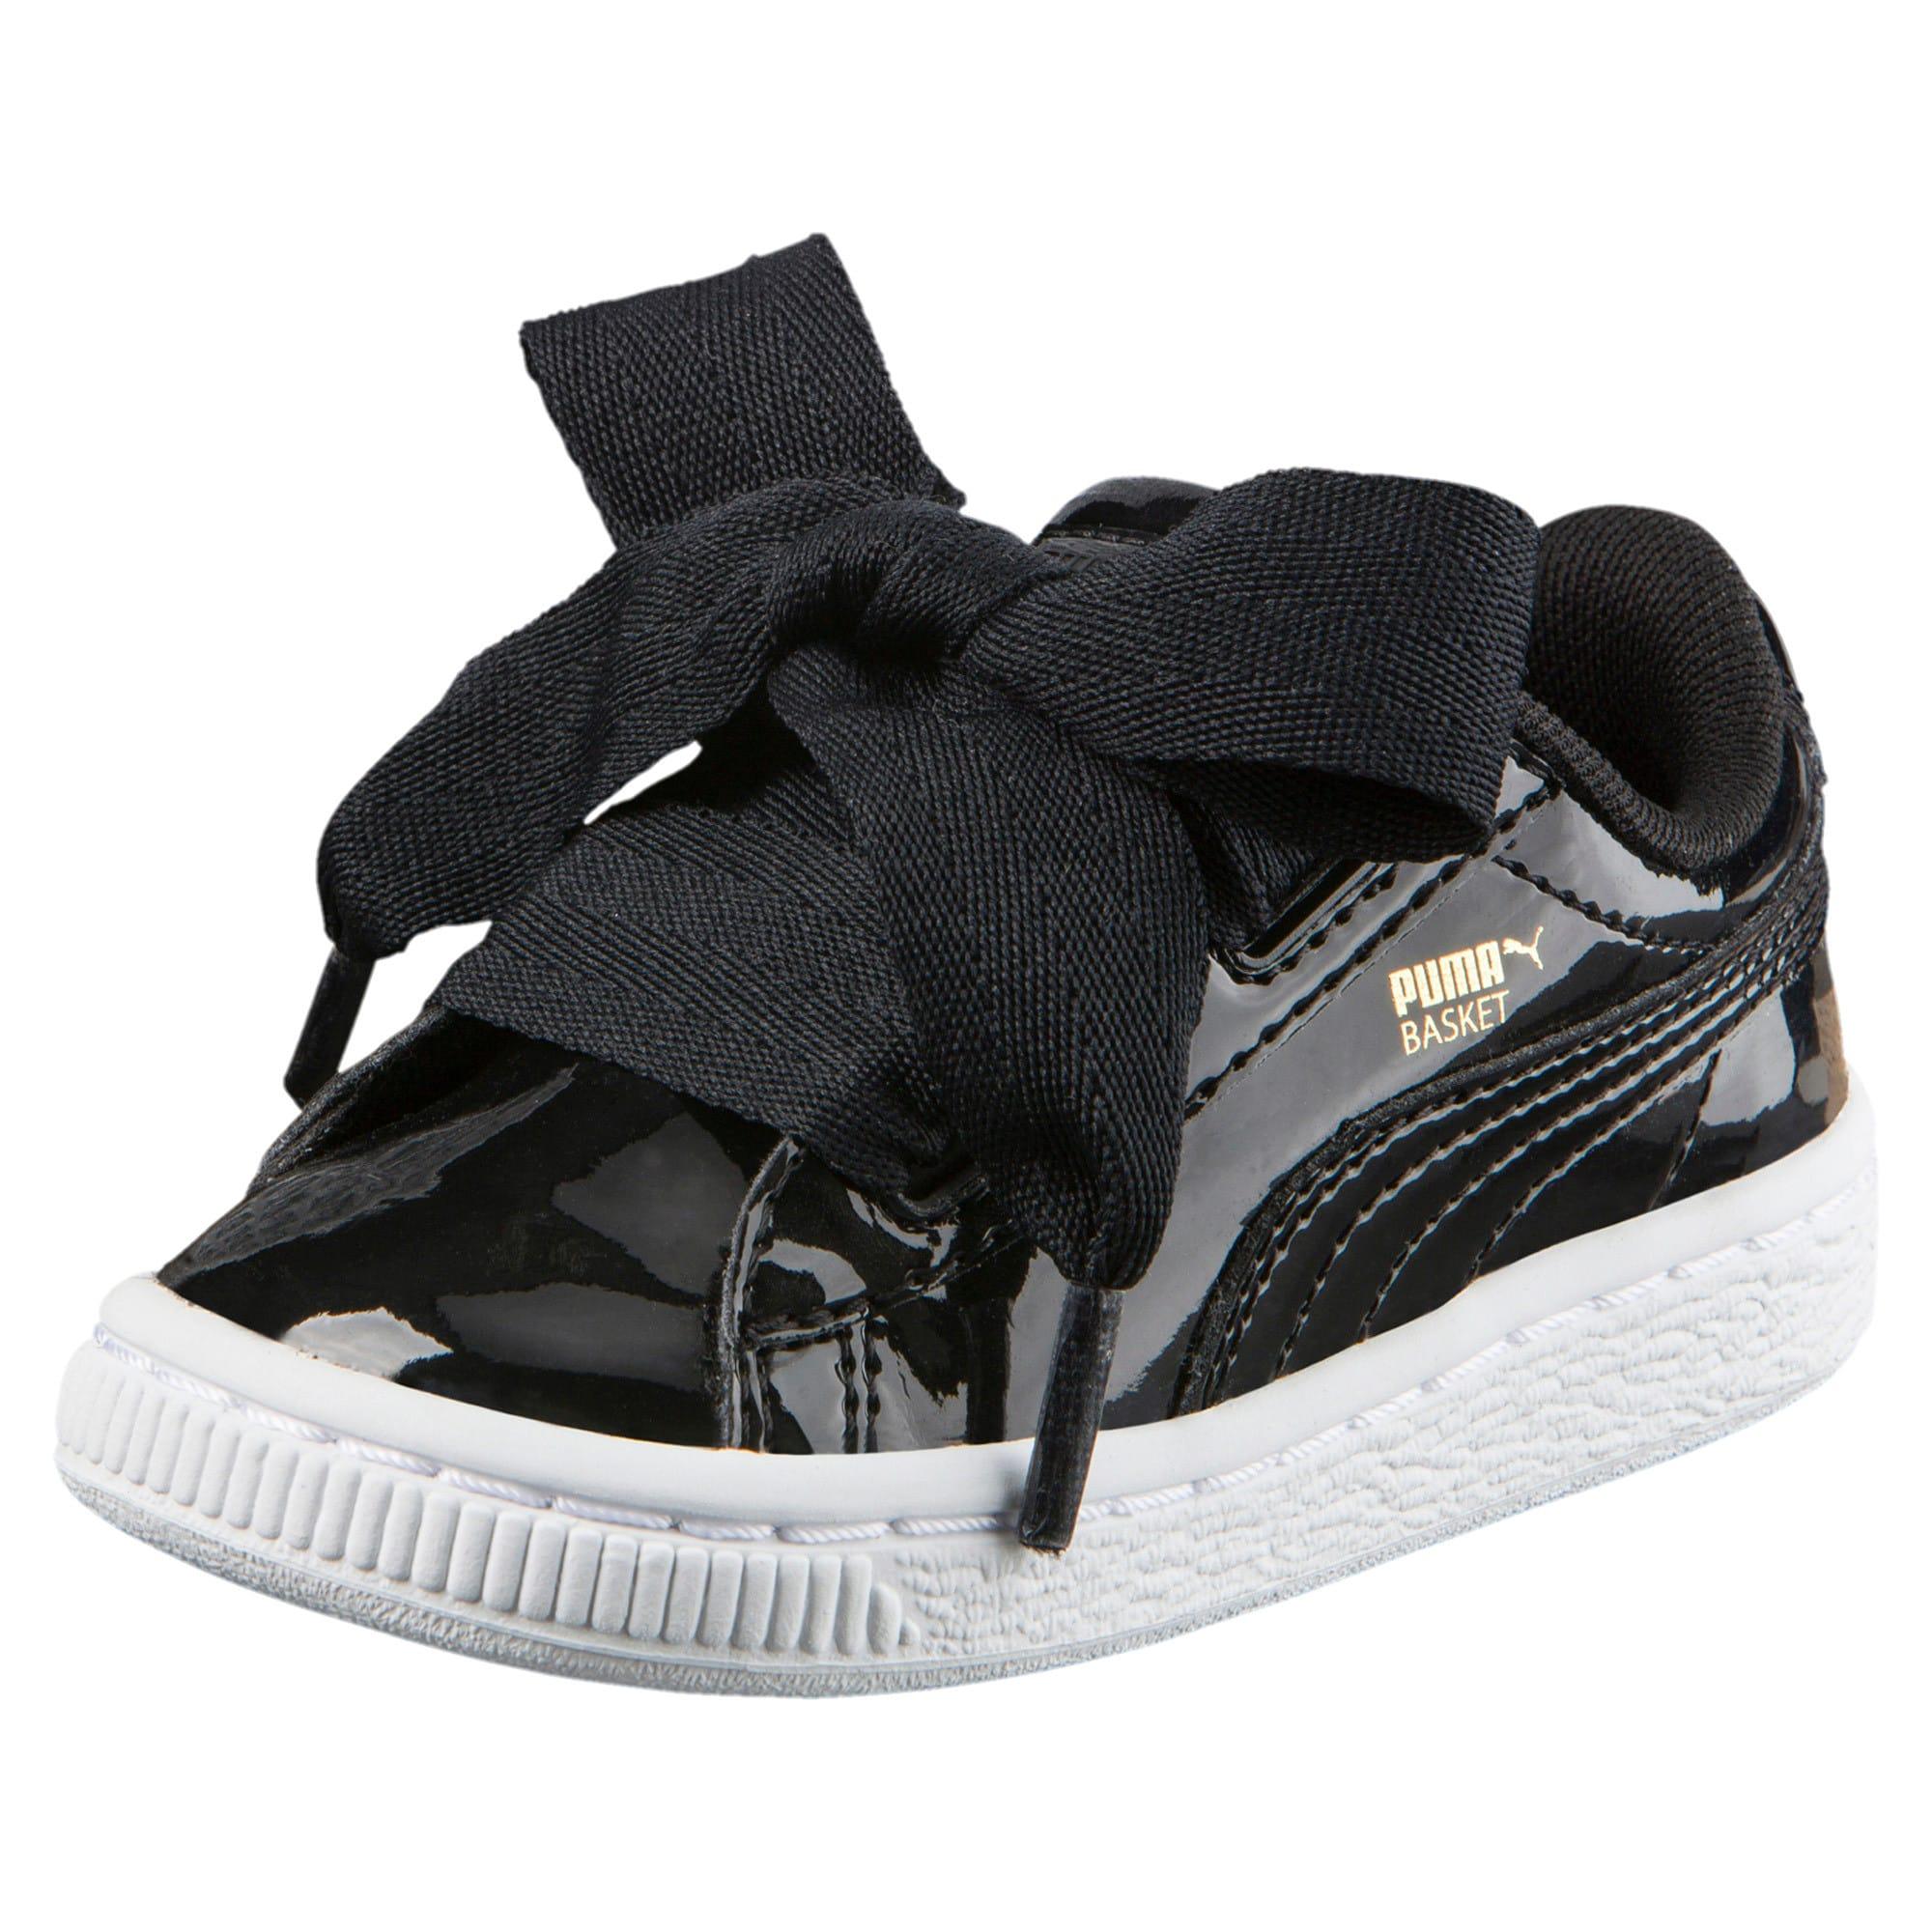 online retailer 6fcf3 7776d Basket Heart Babies' Trainers